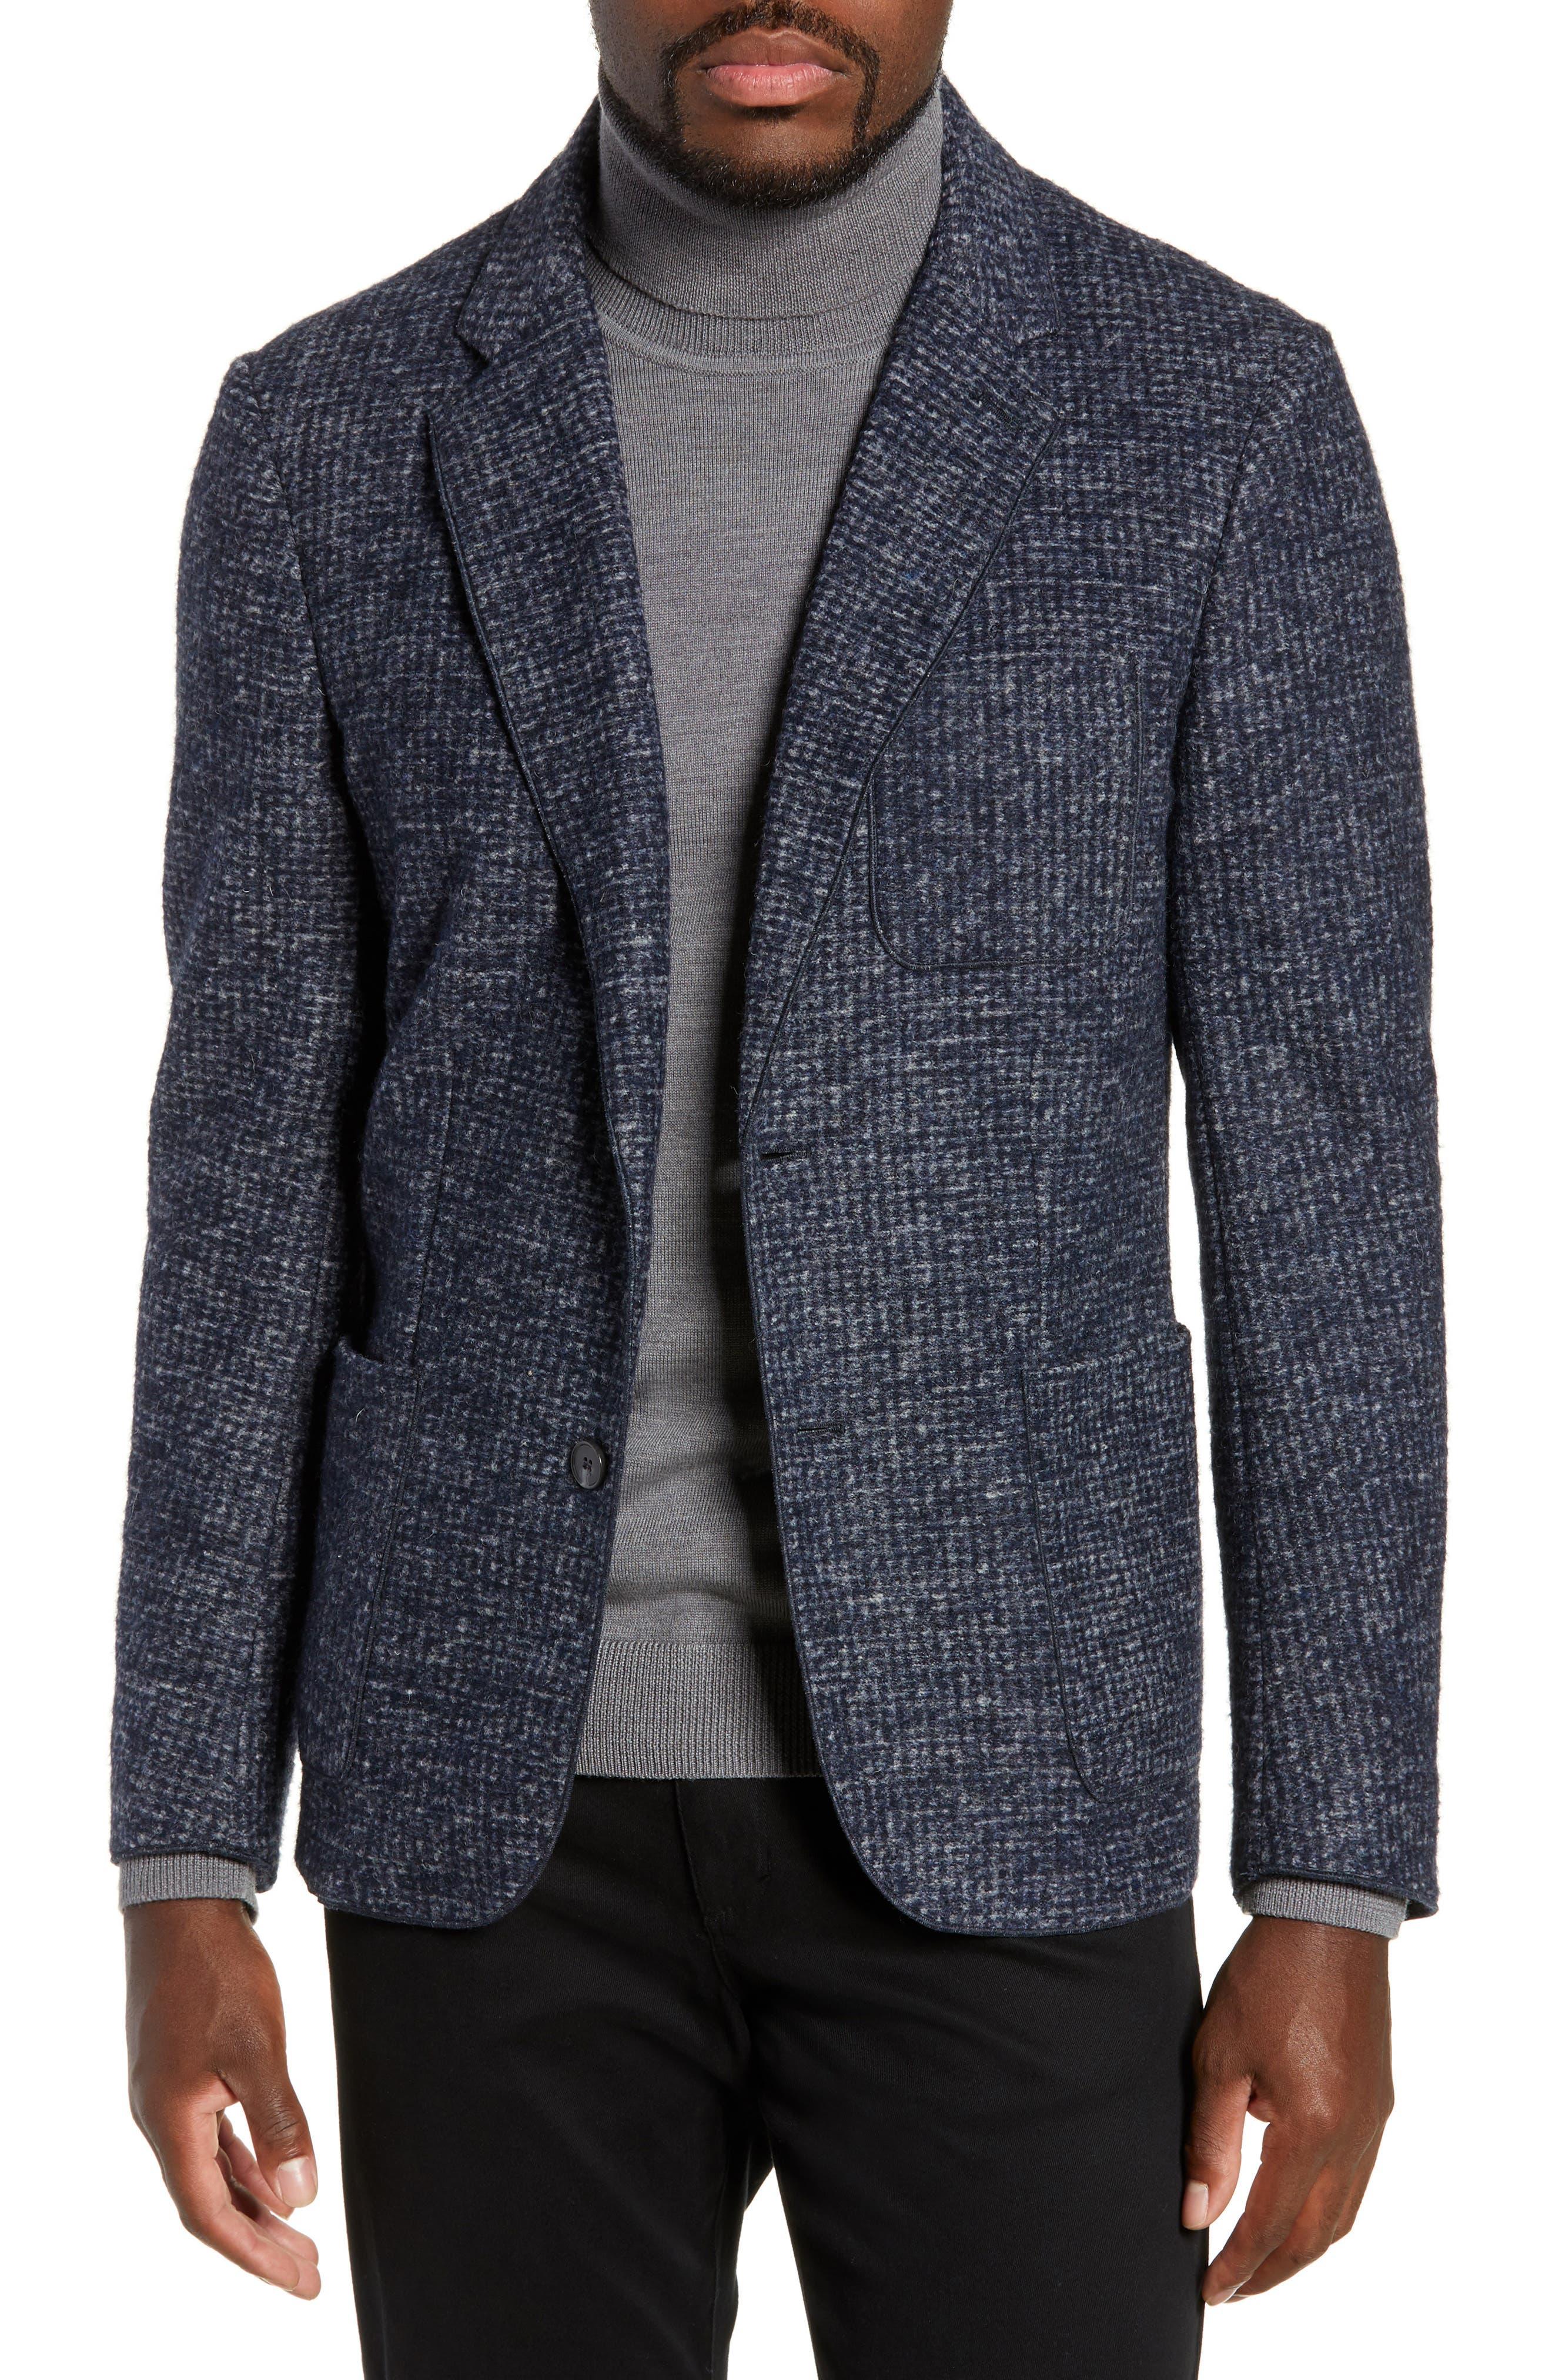 Randolph Houndstooth Knit Sport Coat,                             Main thumbnail 1, color,                             DARK BLUE